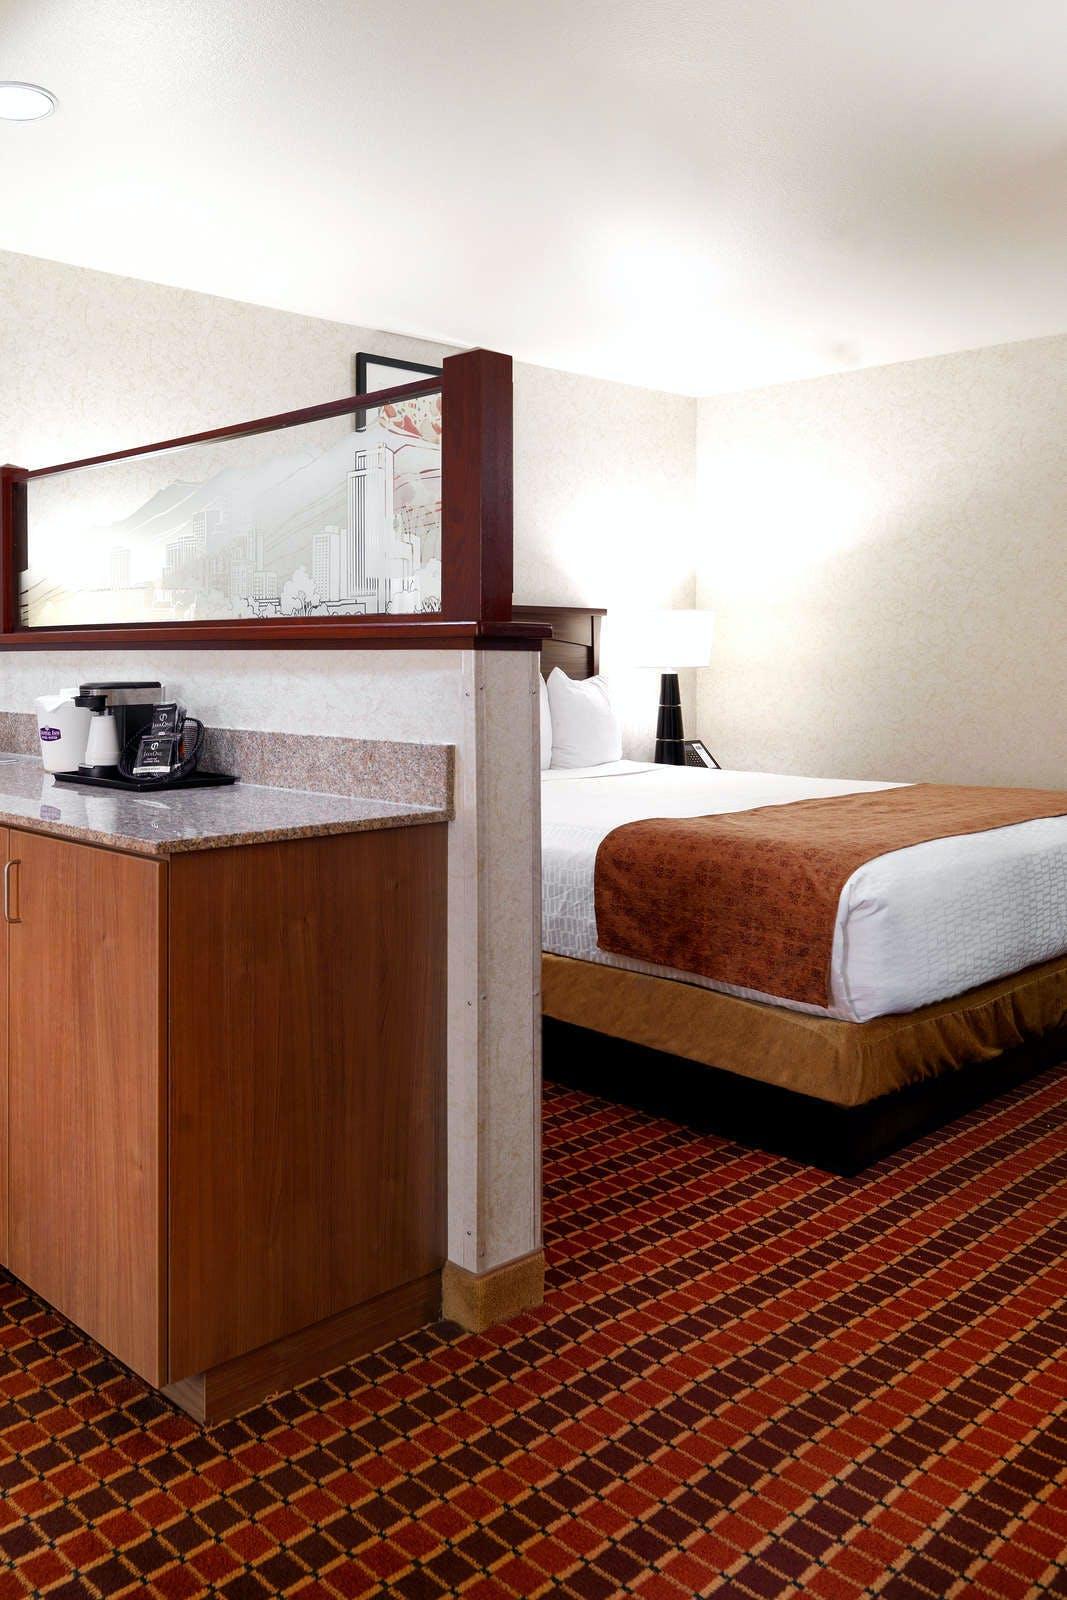 Crystal Inn Hotel & Suites Salt Lake City - Downtown